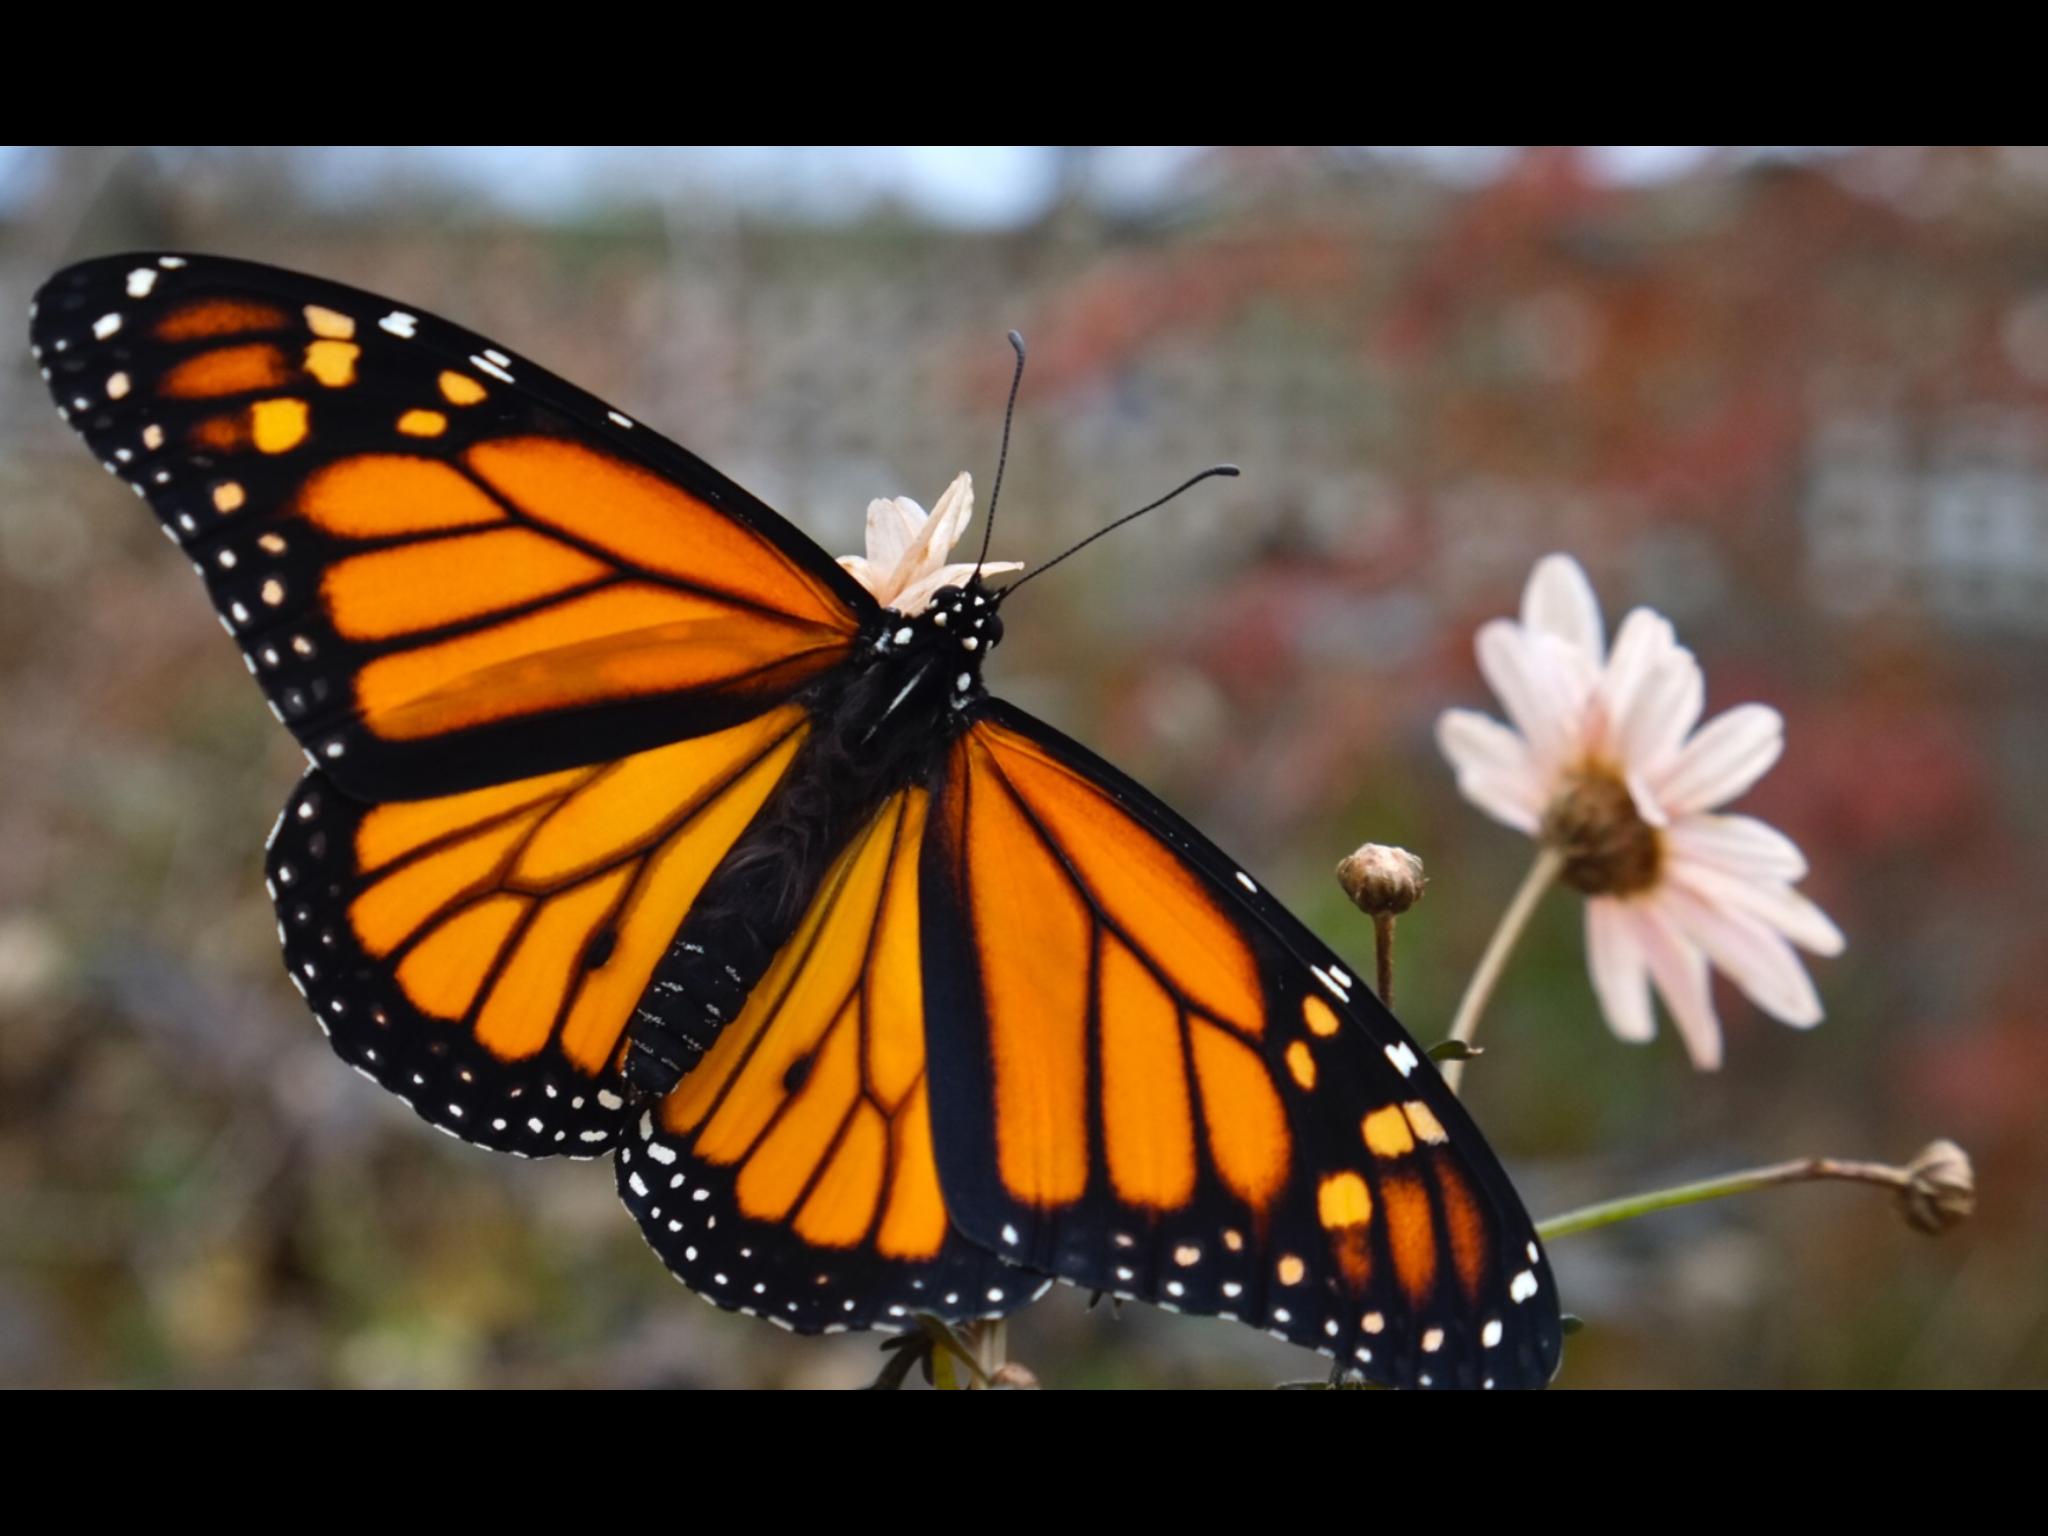 Monarch Butterflies.-5e0974e6-7a45-4e32-9c69-5bec1180b88e.png